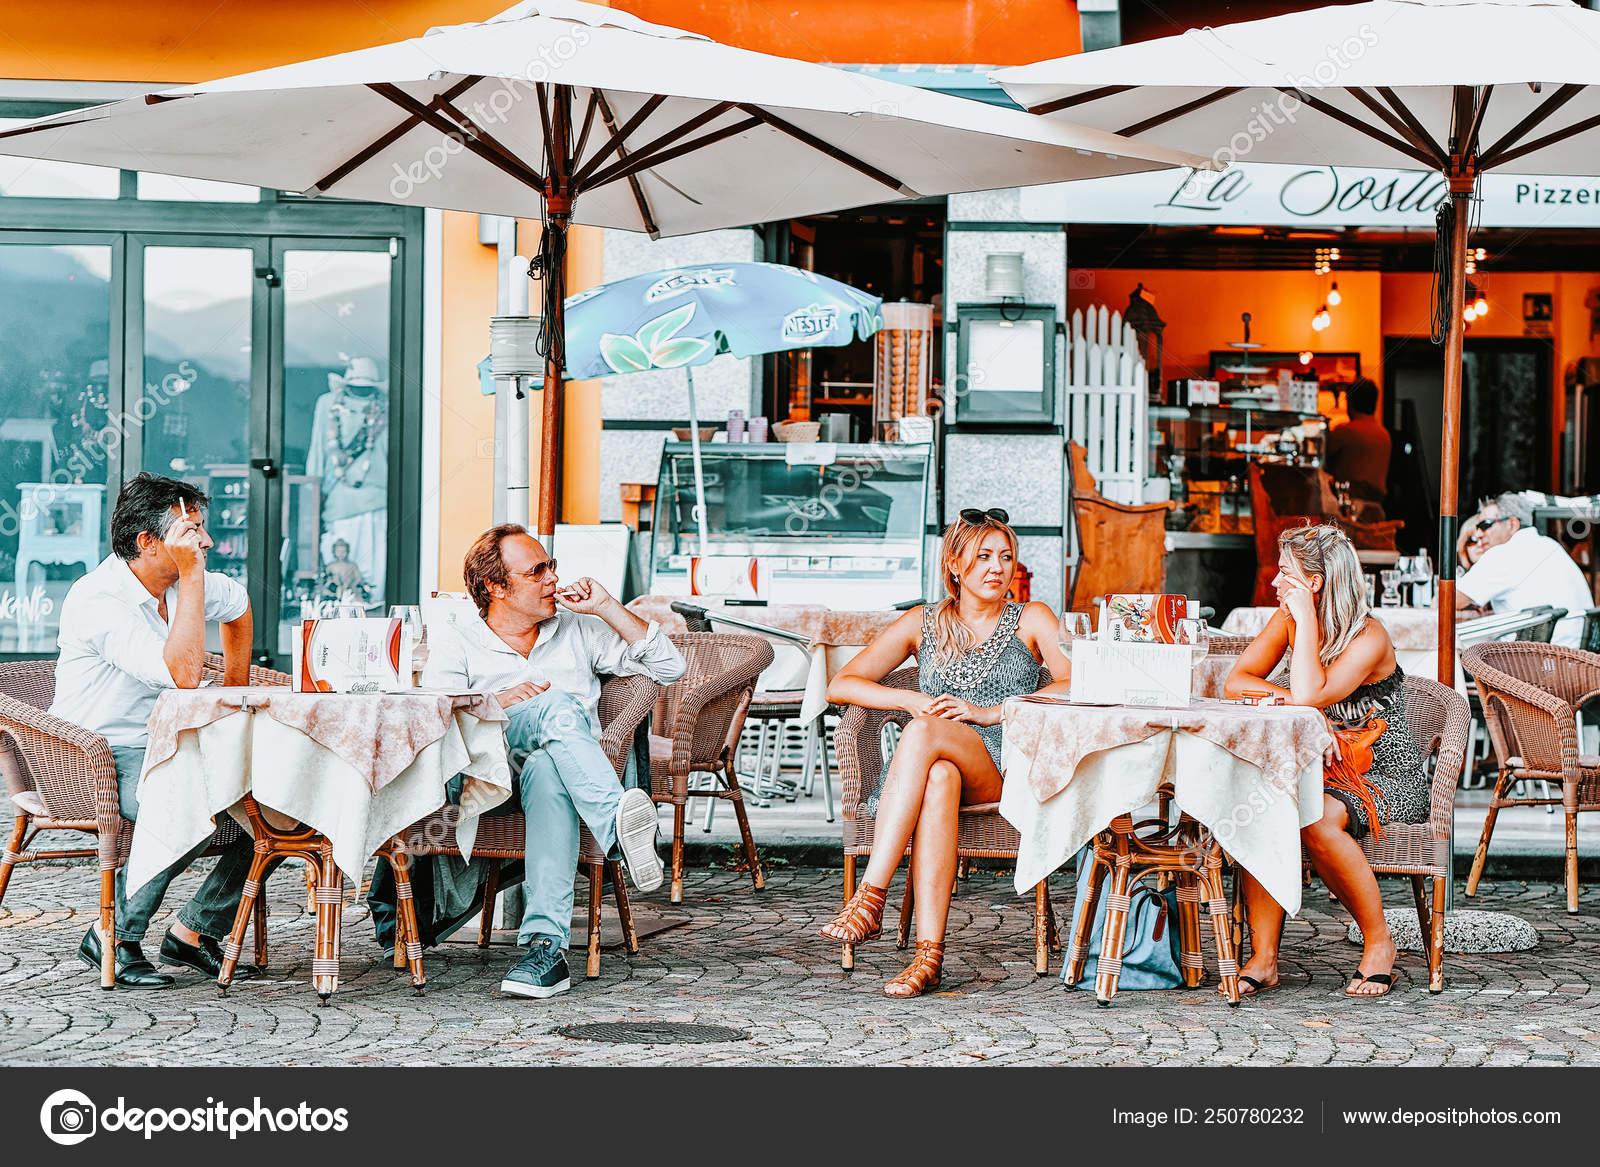 People In Street Cafe In Romantic Luxury Resort Ascona Stock Editorial Photo C Erix2005 250780232